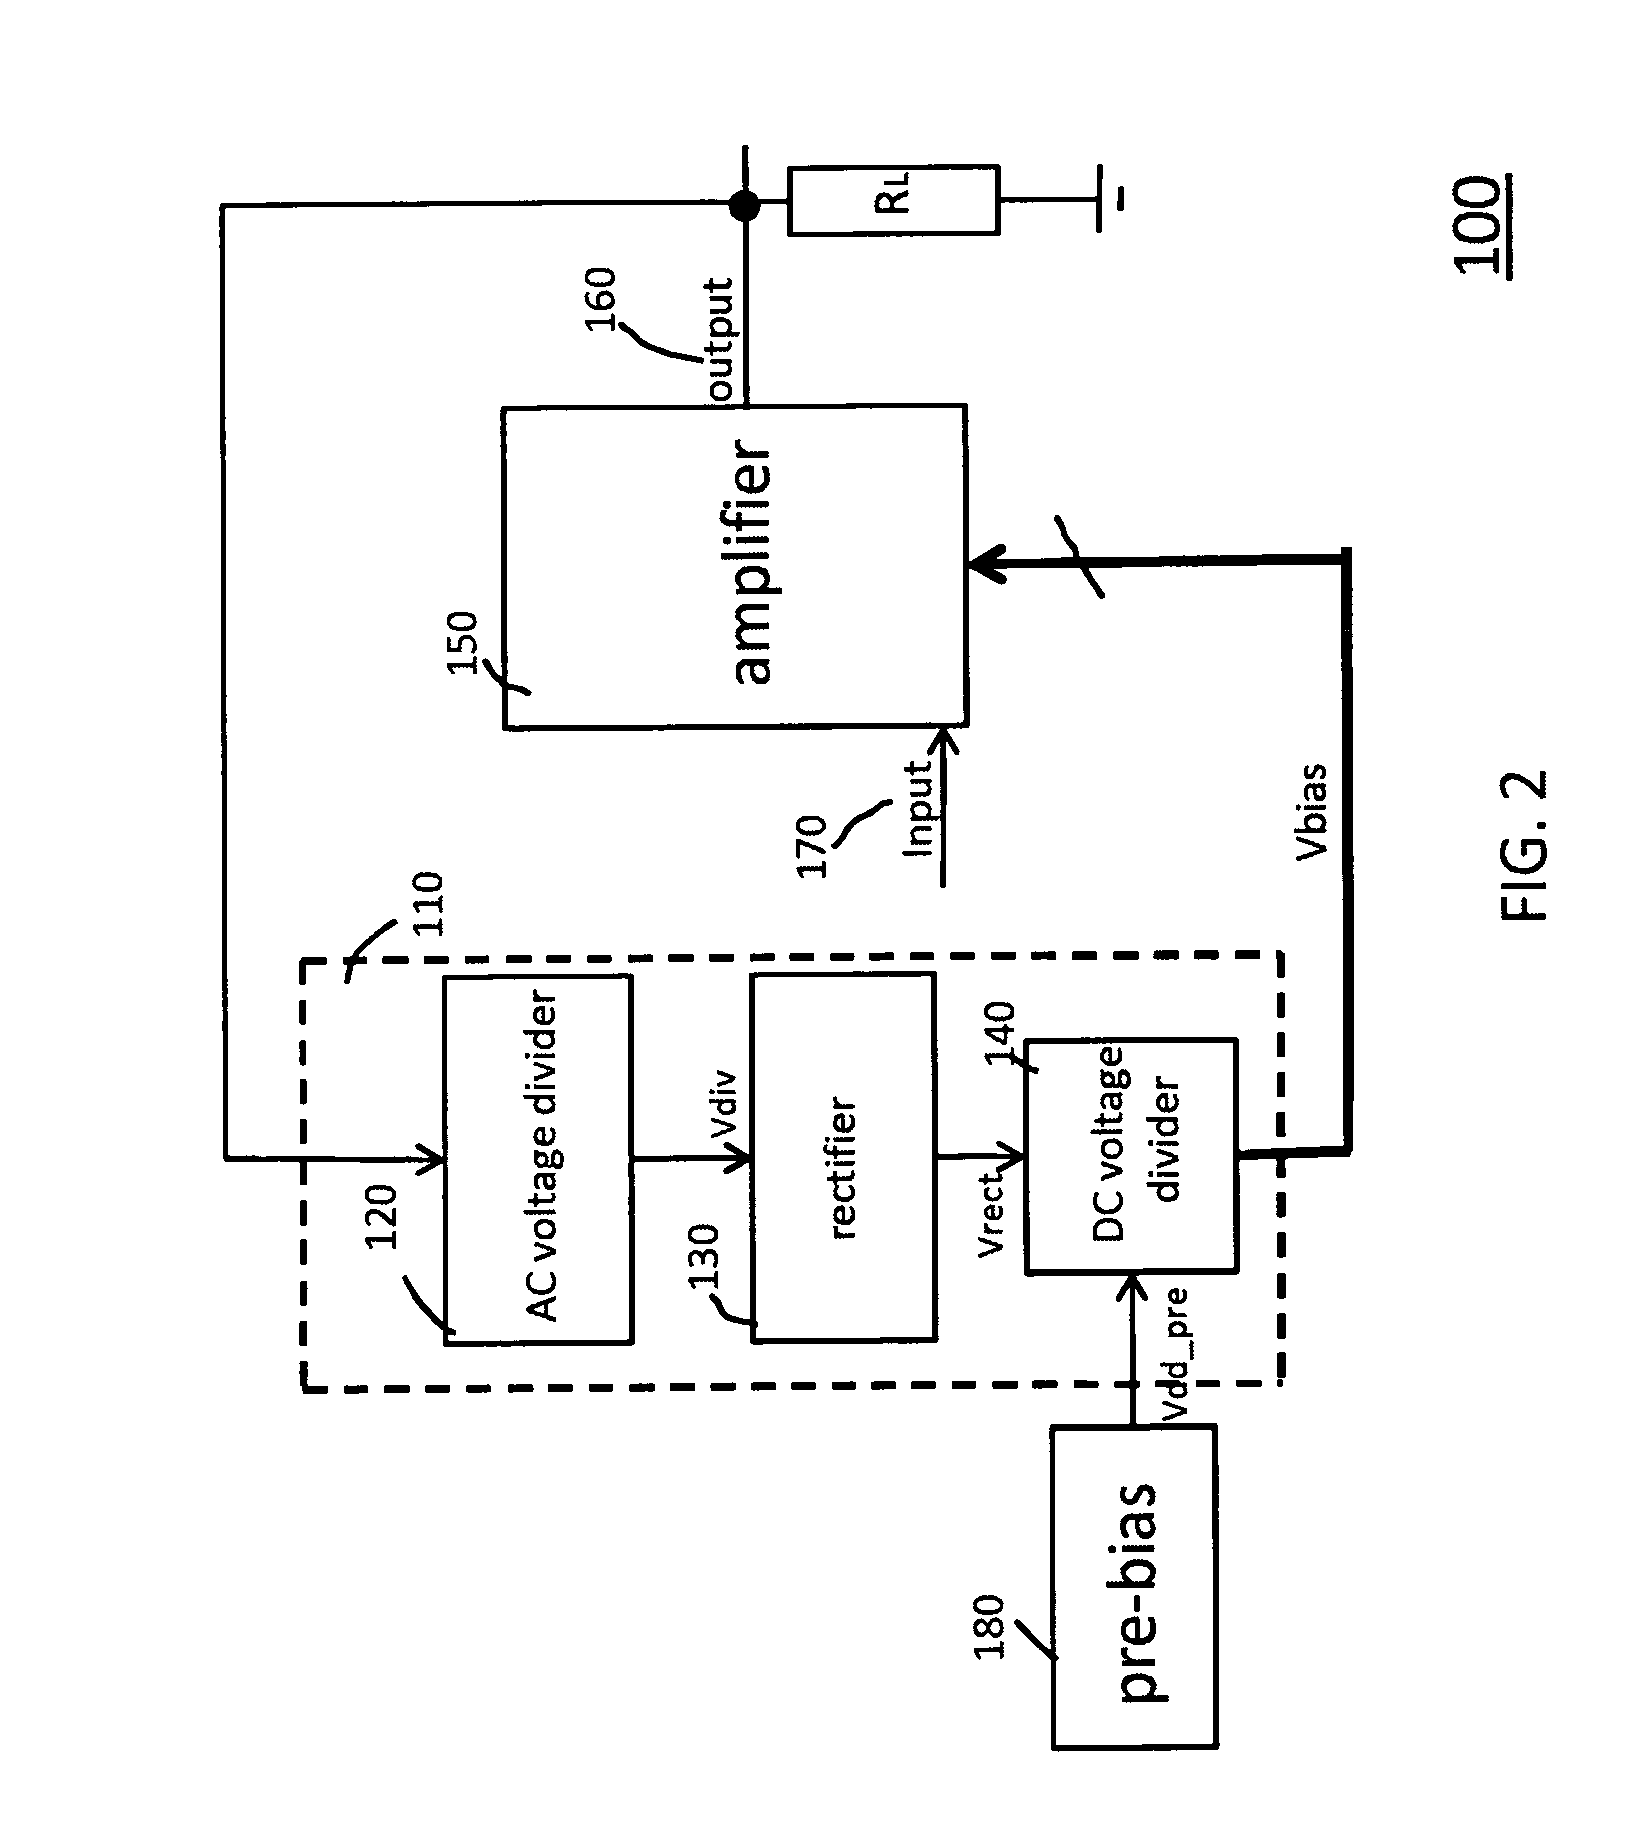 patente us8111104